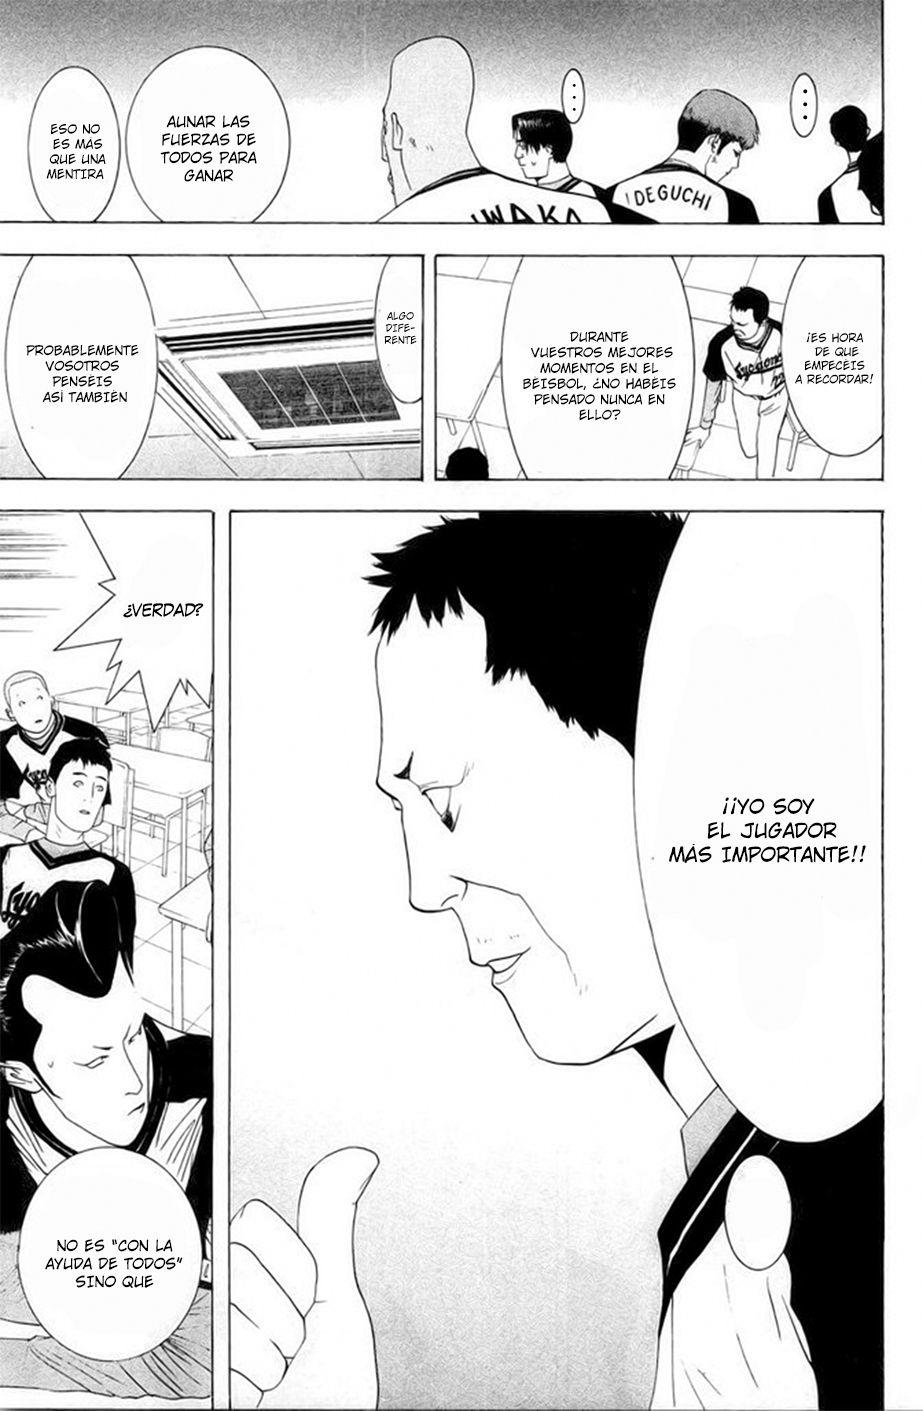 https://c5.ninemanga.com/es_manga/49/2993/463798/c7b1405eef2648f27d23aedf7aff903f.jpg Page 16